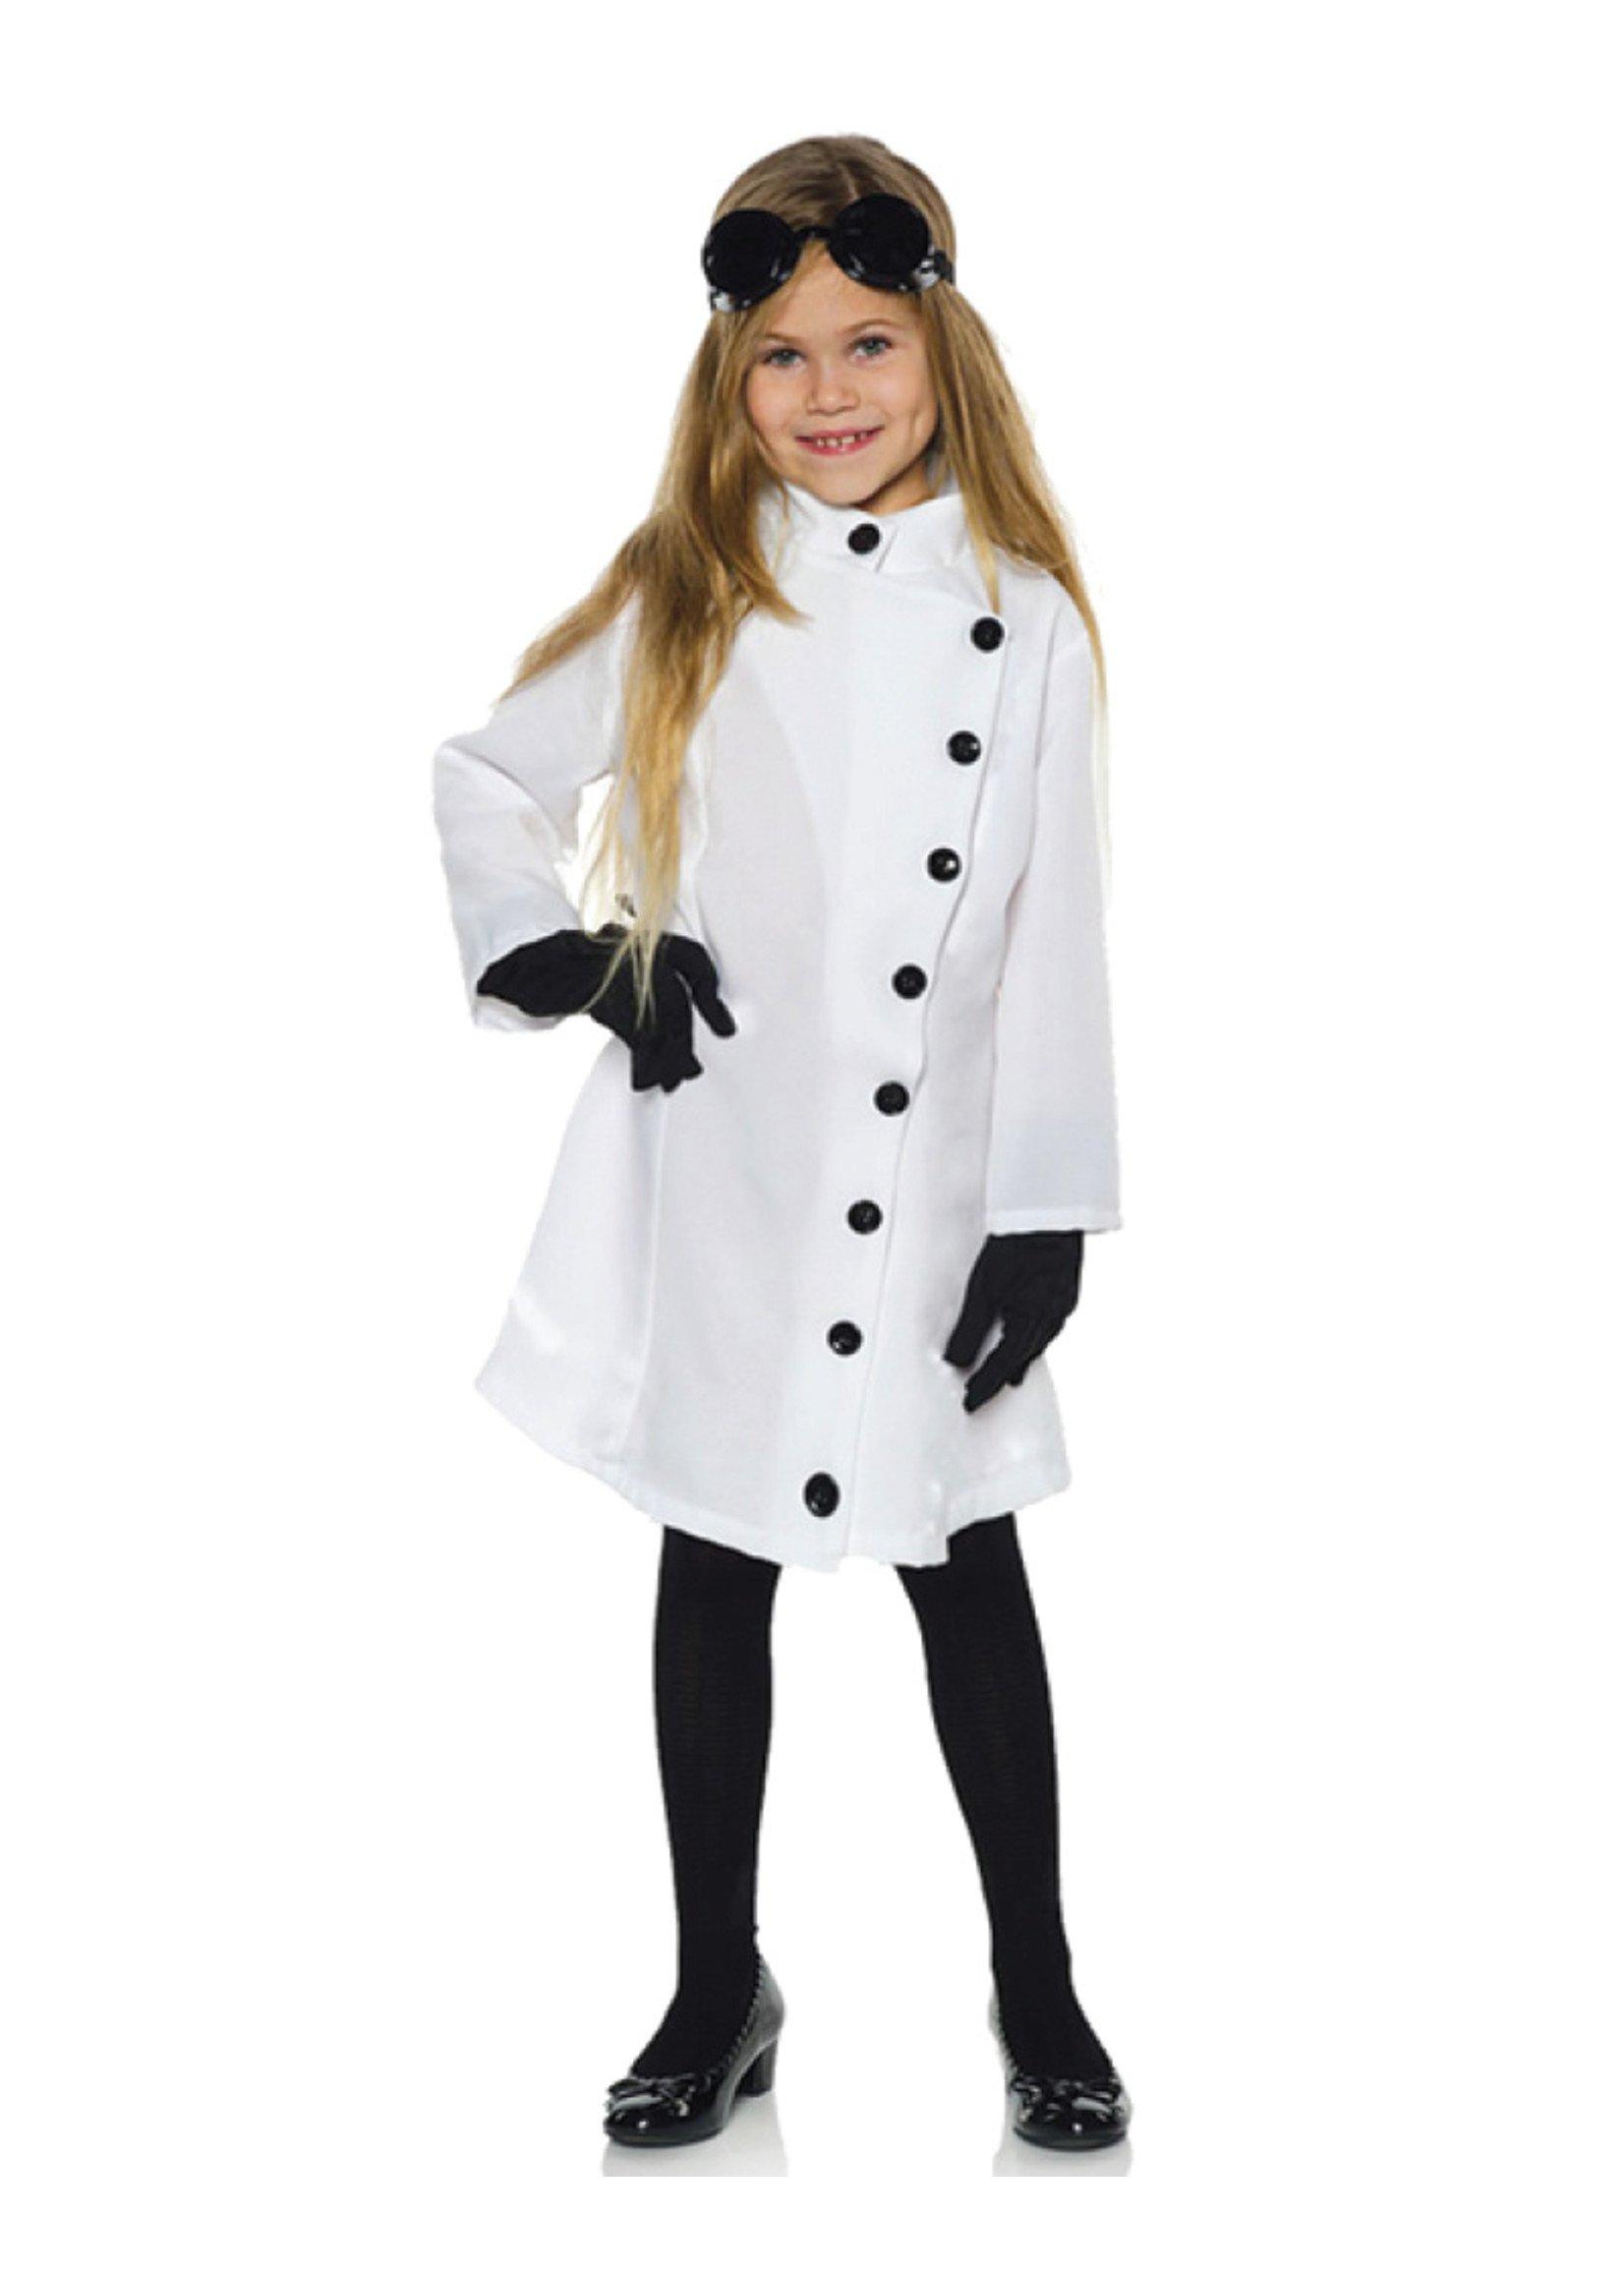 Mad Science Costume - Girls